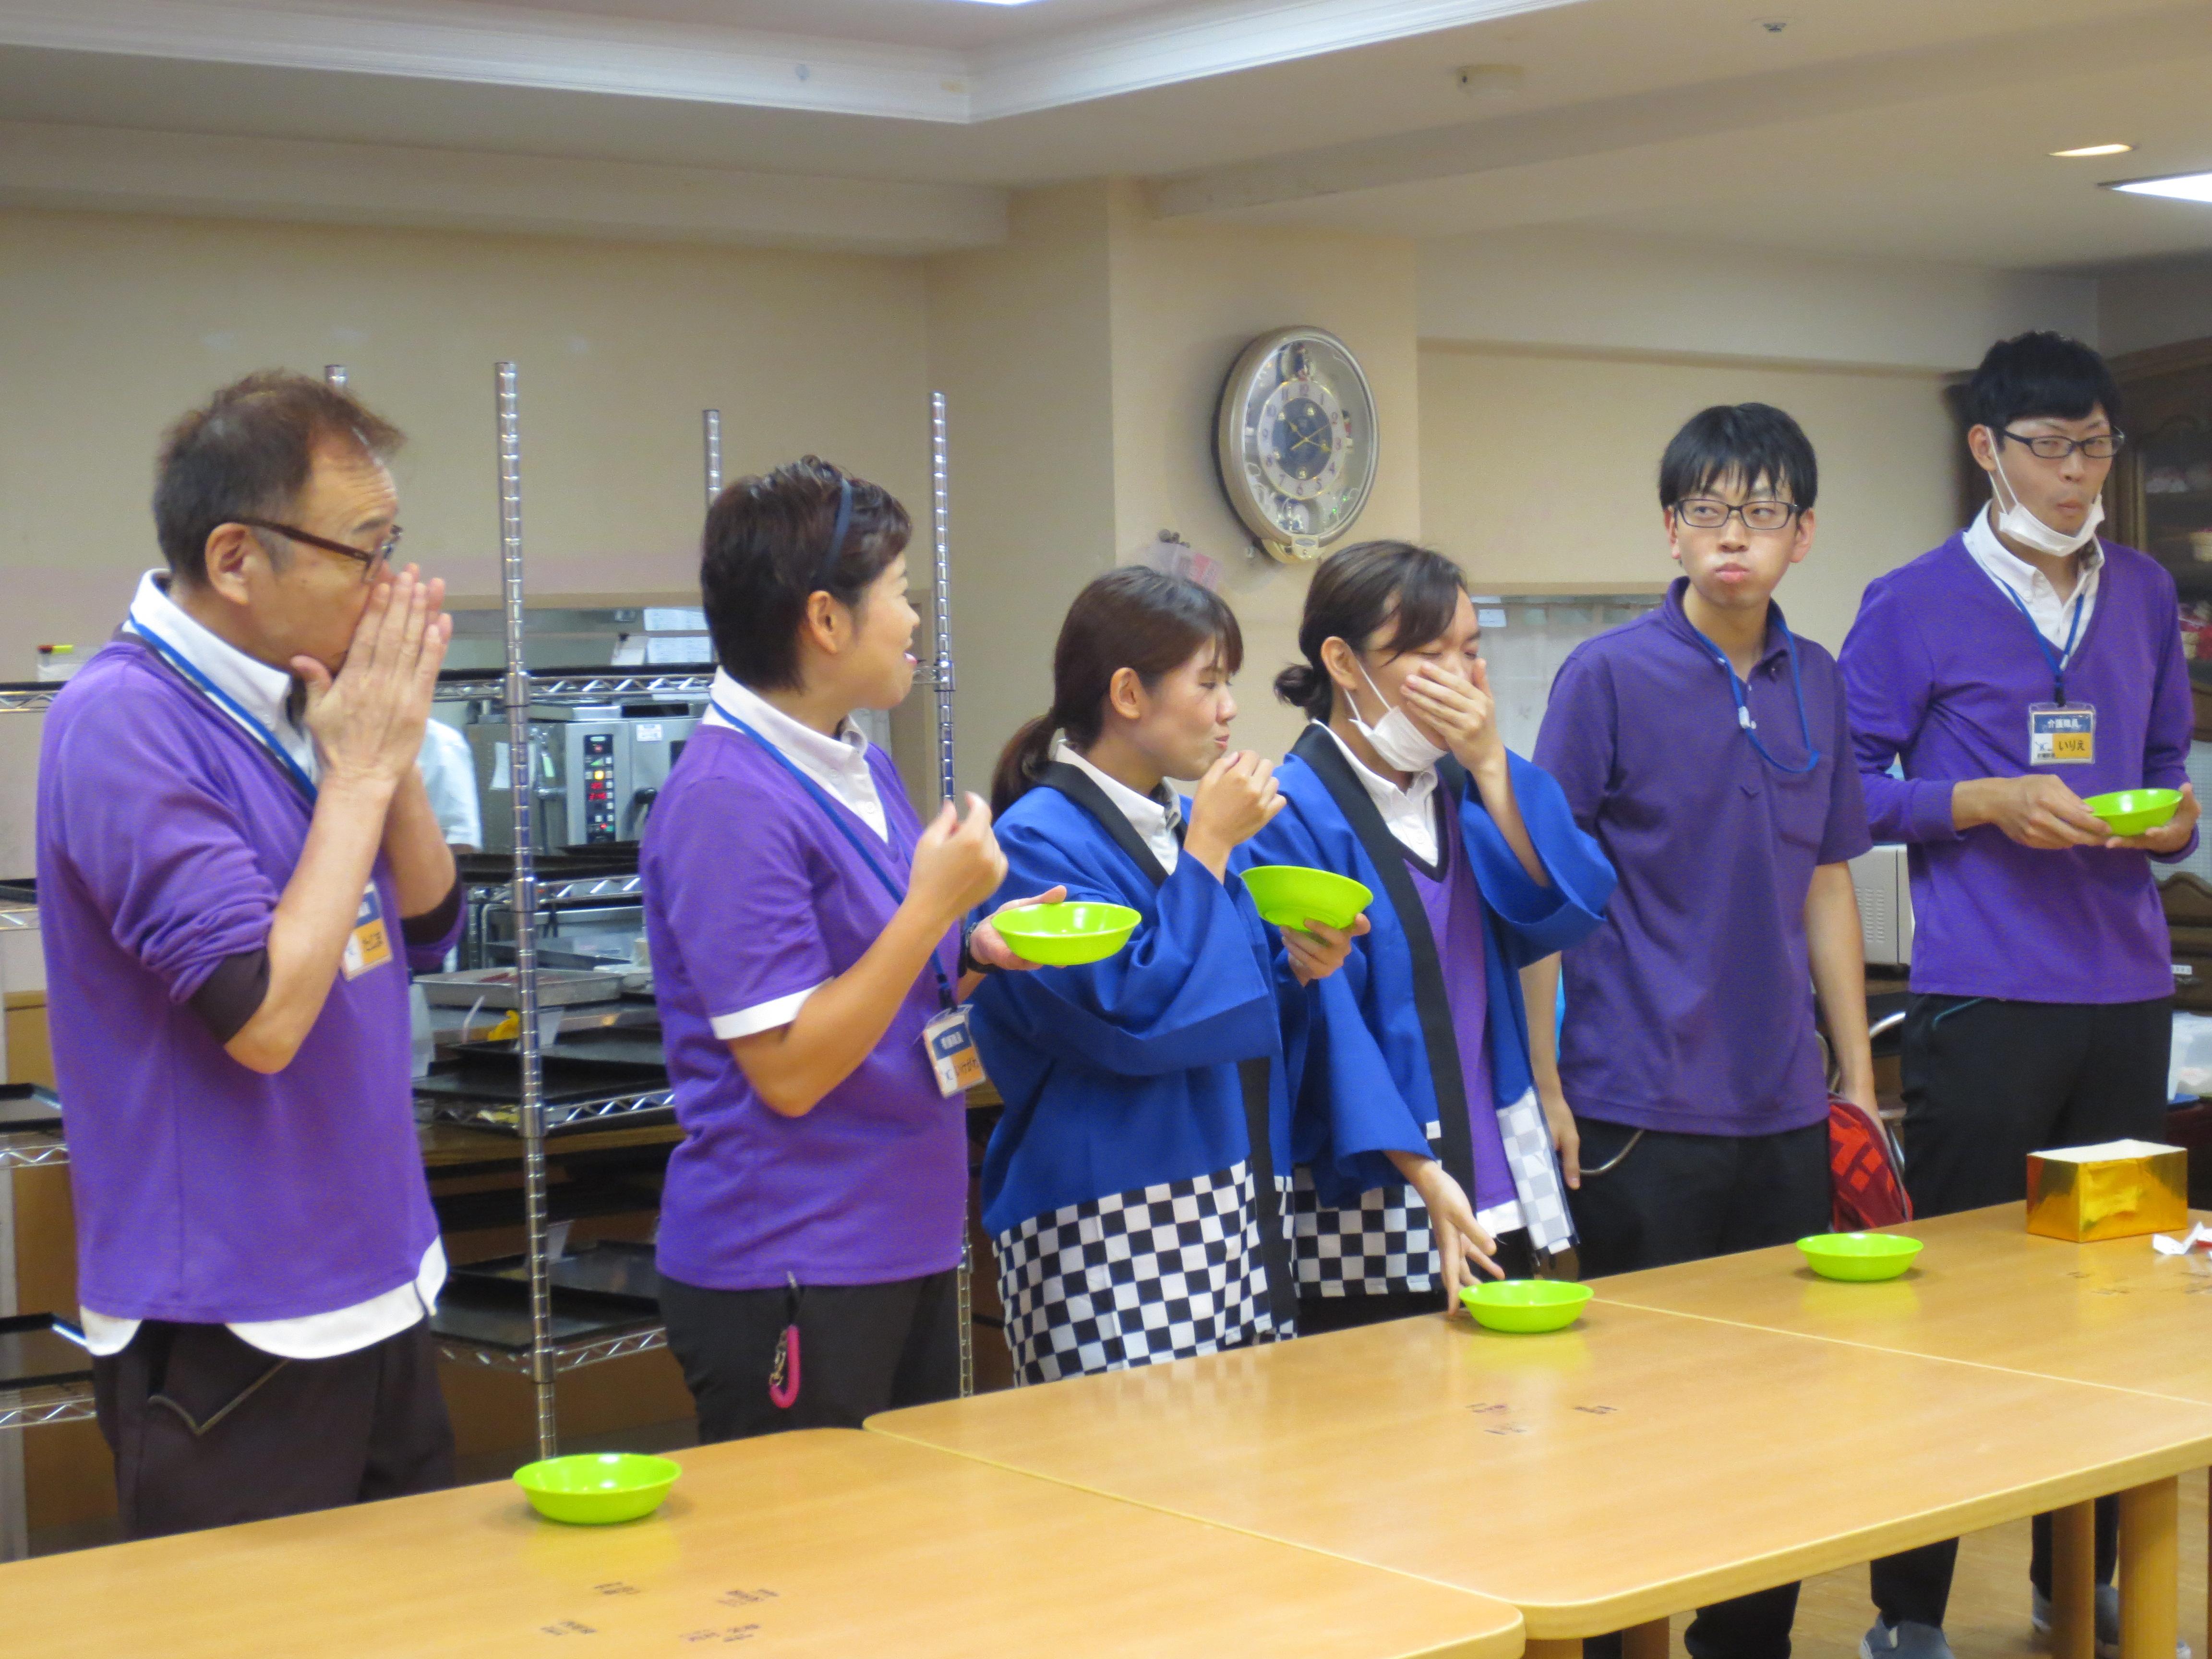 http://www.supercourt.jp/blog/sakai/IMG_9164.JPG